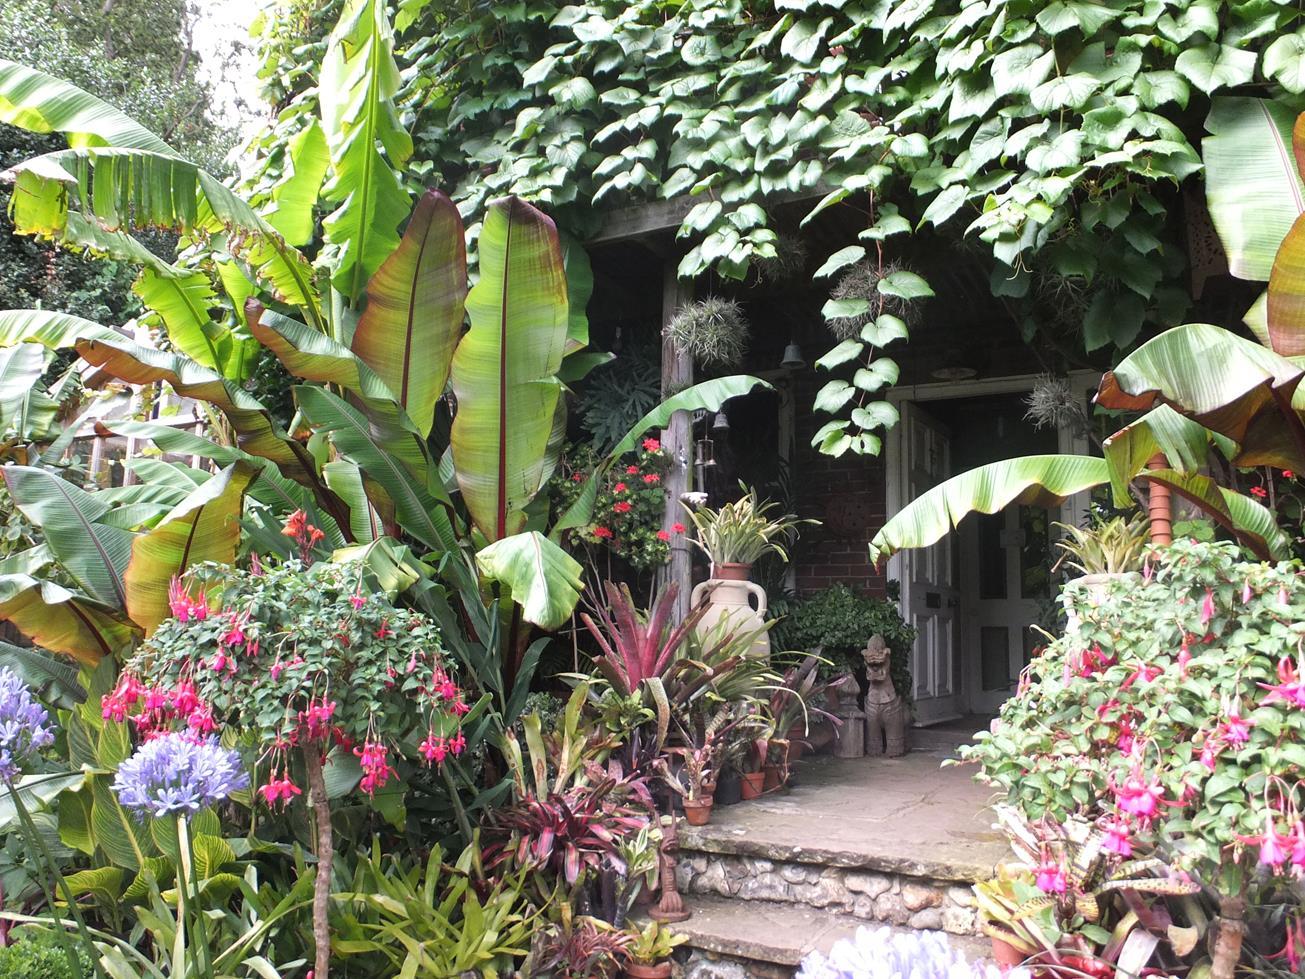 joli jardin exotique idee plantes verte et fleur